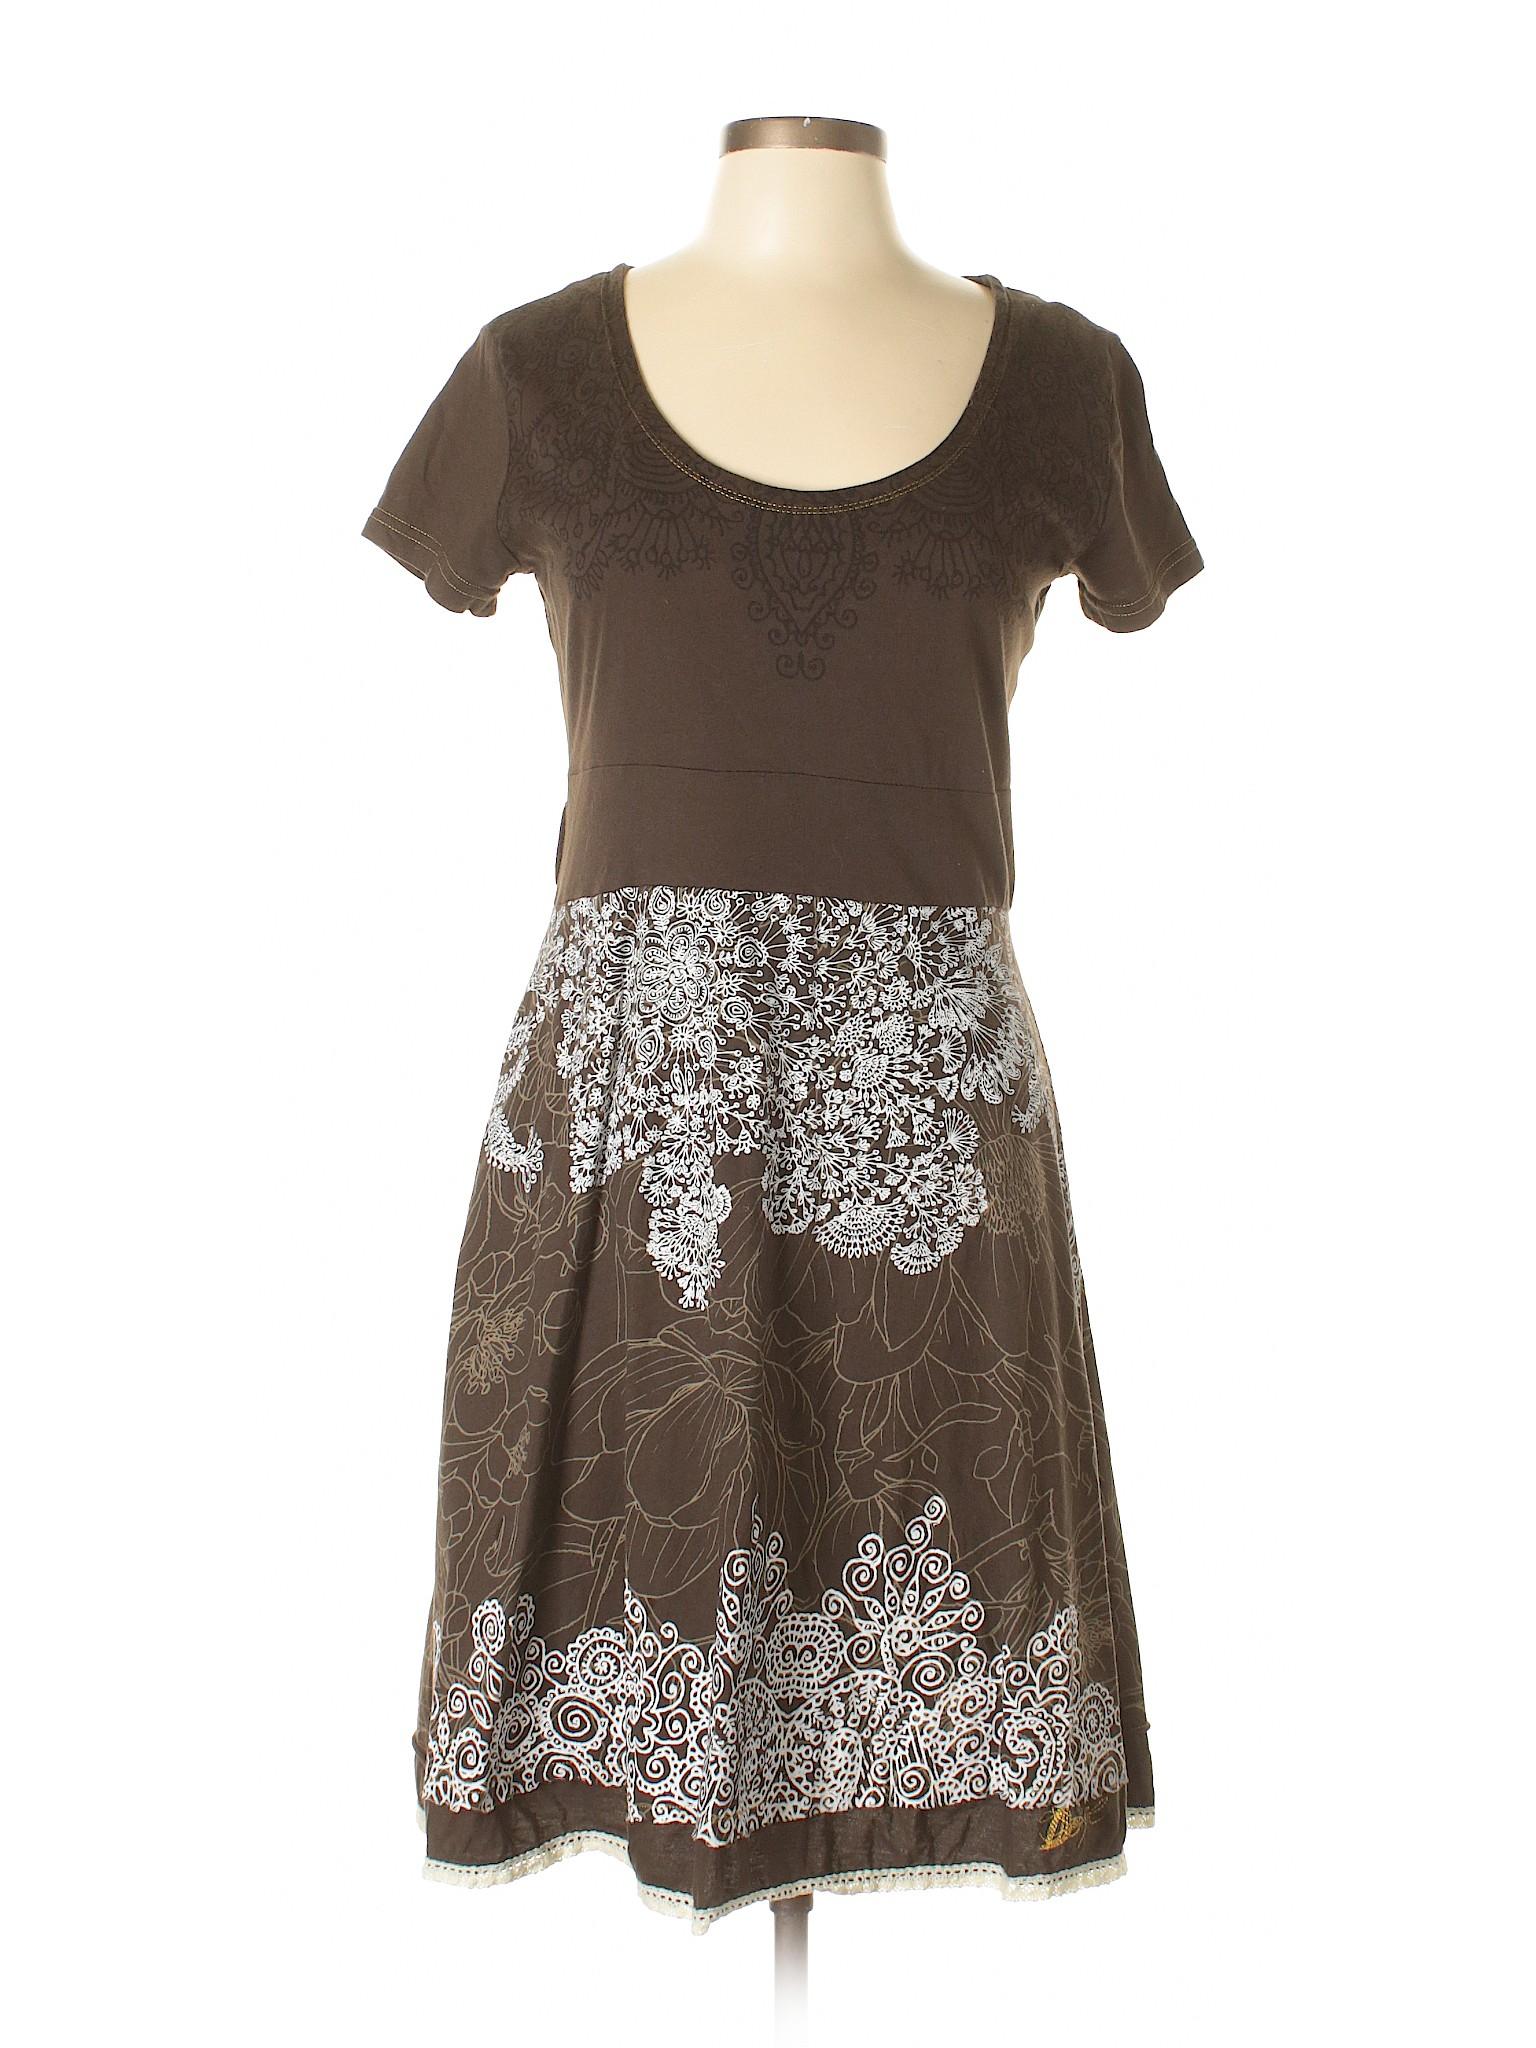 Dress Selling Desigual Desigual Selling Casual SYww7TqC